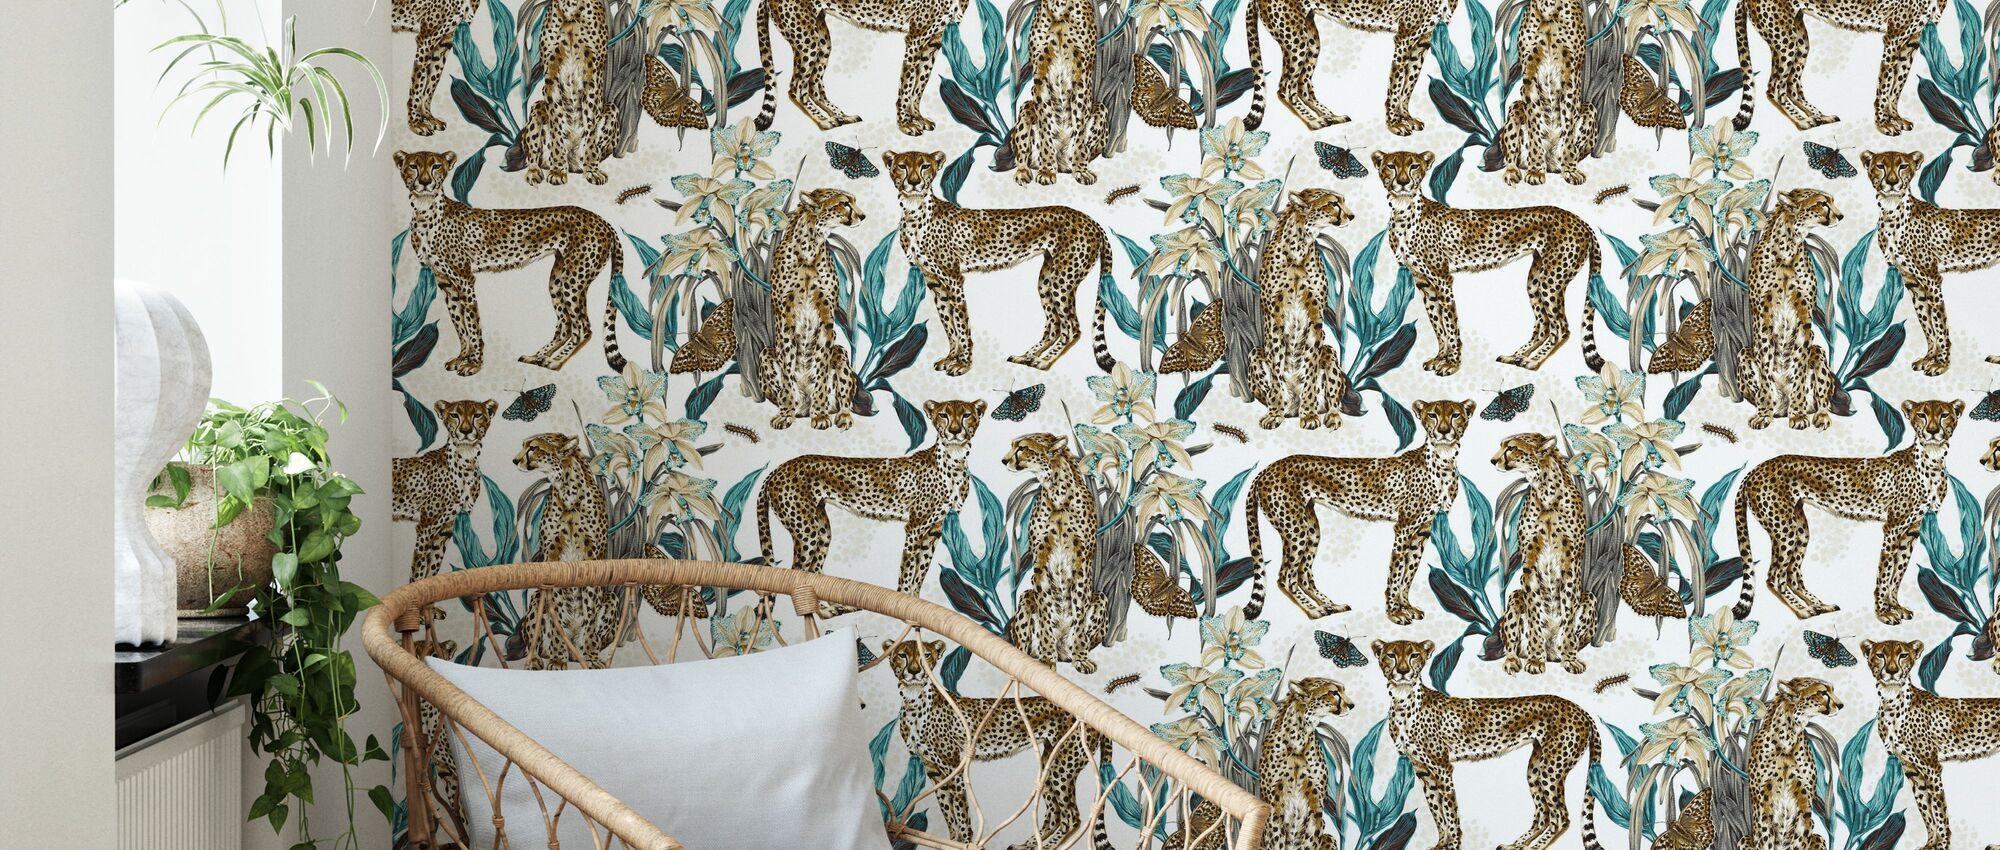 Cheetah Reveries - Cognac and Turqouise - Wallpaper - Living Room